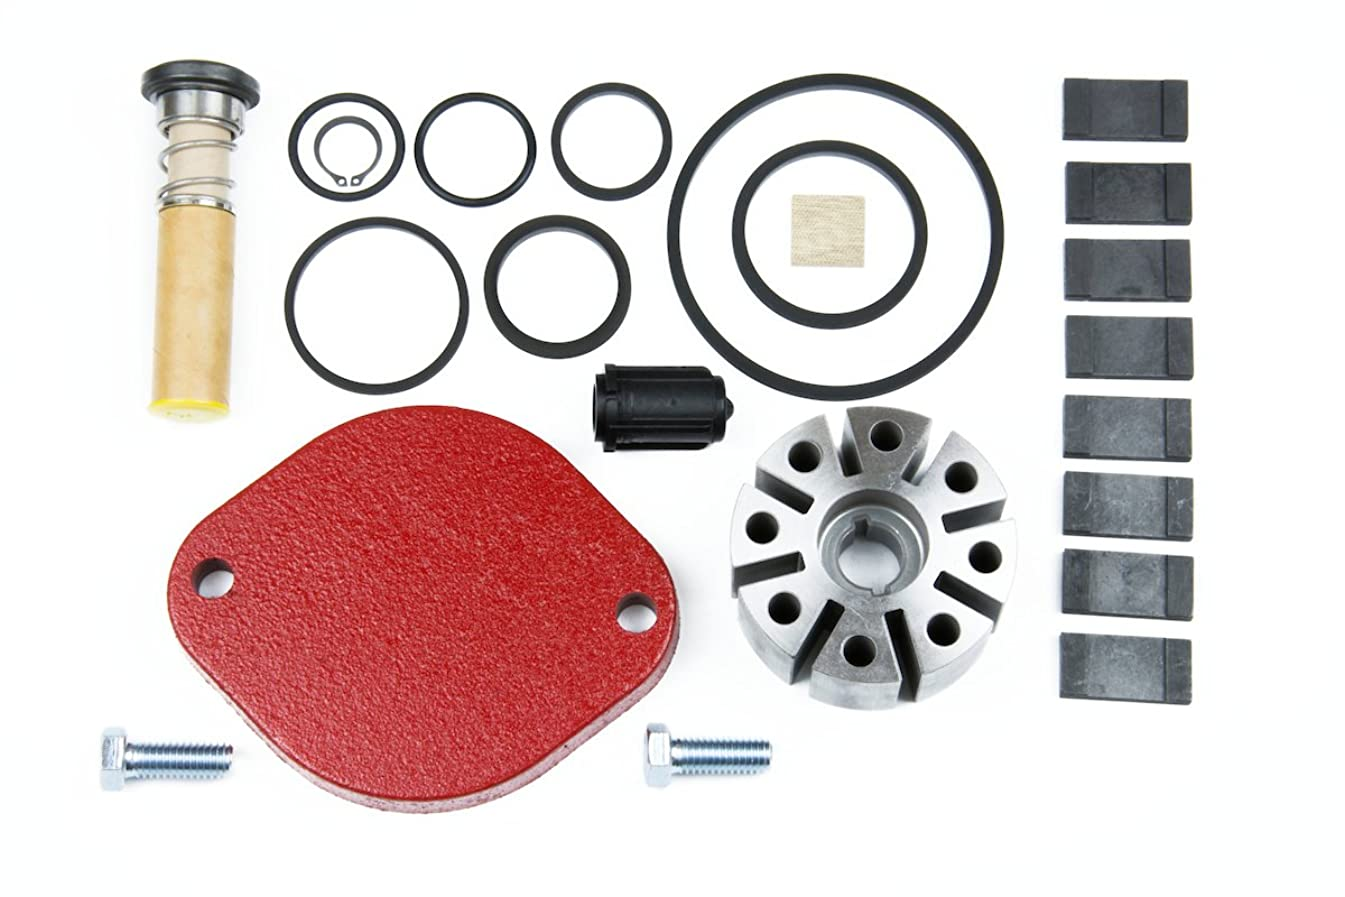 Fill-Rite 700KTF2659 Rebuild Kit for Series 700B Pumps Version Only, Carbon Vane